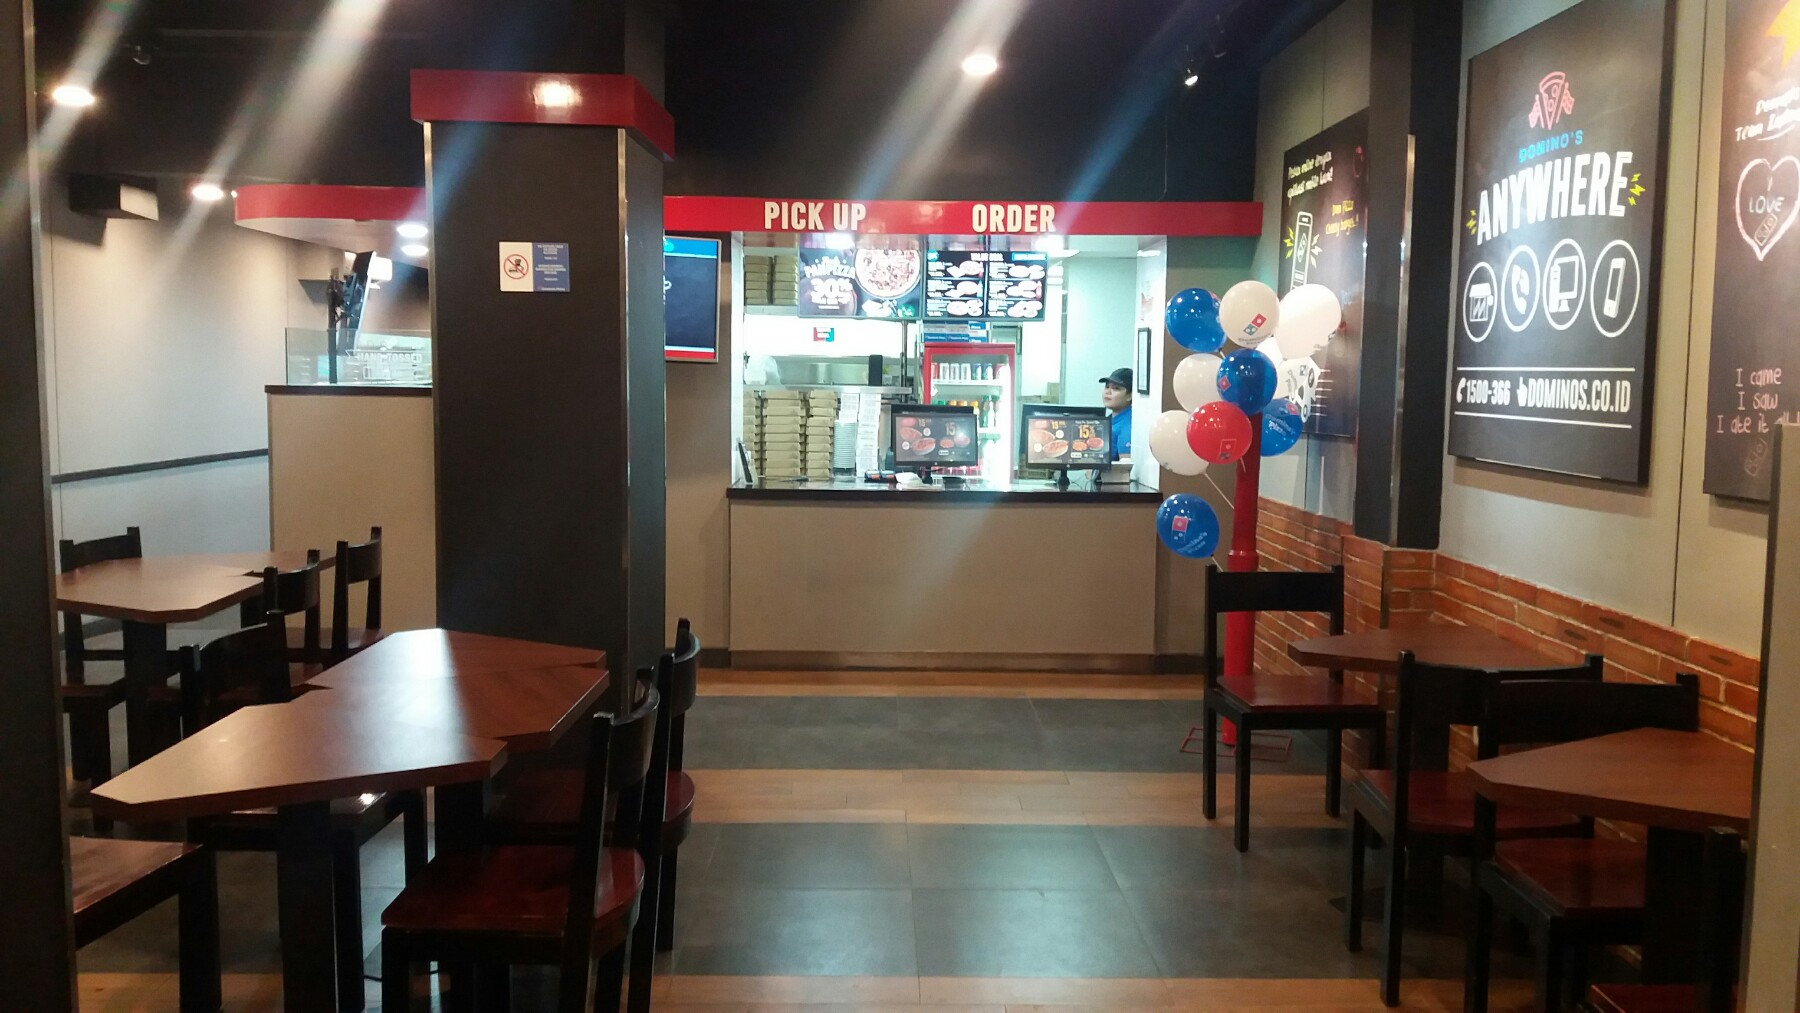 Domino's Pizza - Kec Sawah Besar, Jakarta Pusat